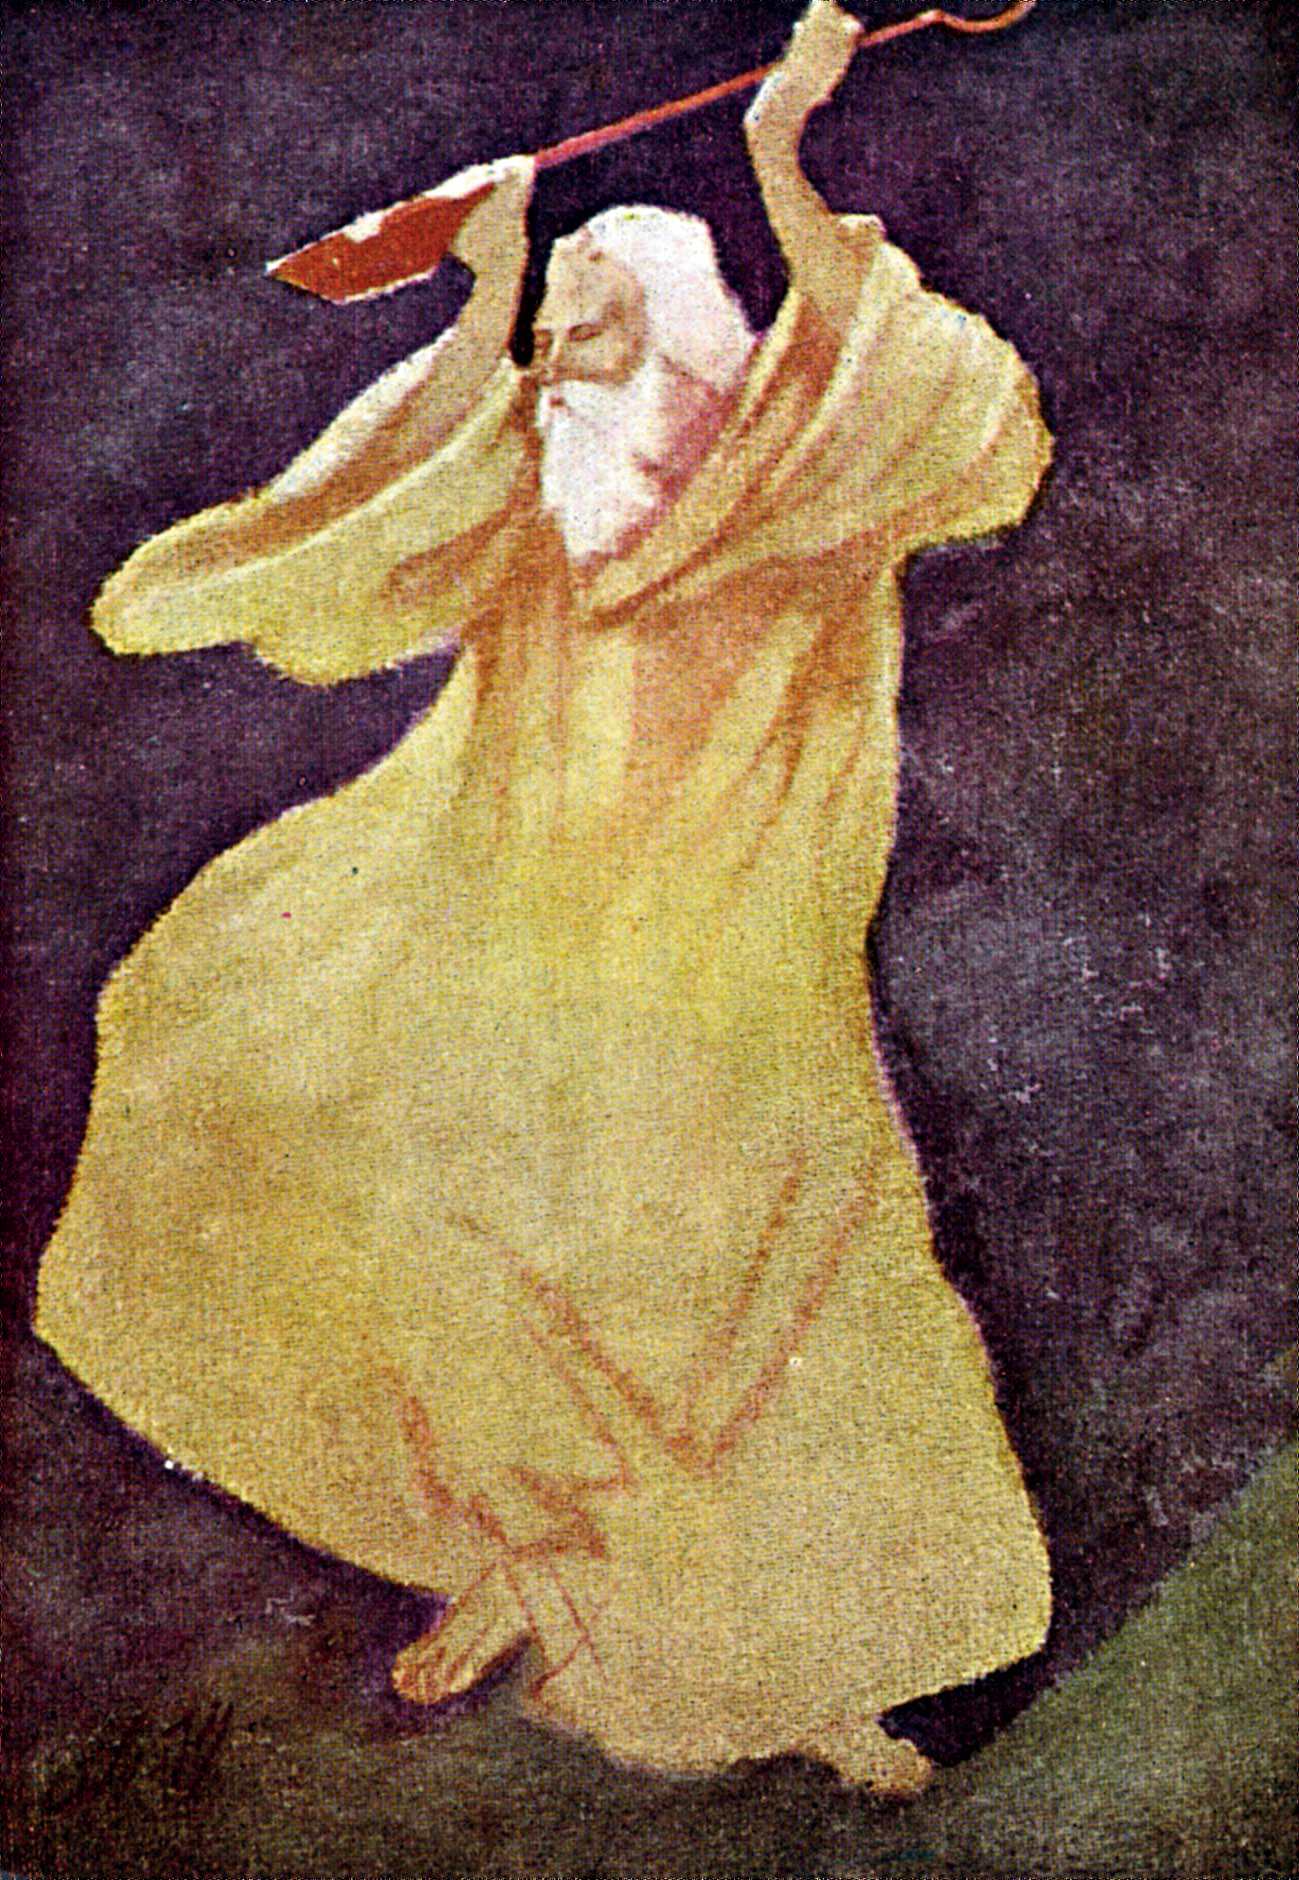 A painting of Rabindranath Tagore by Abanindranath Tagore